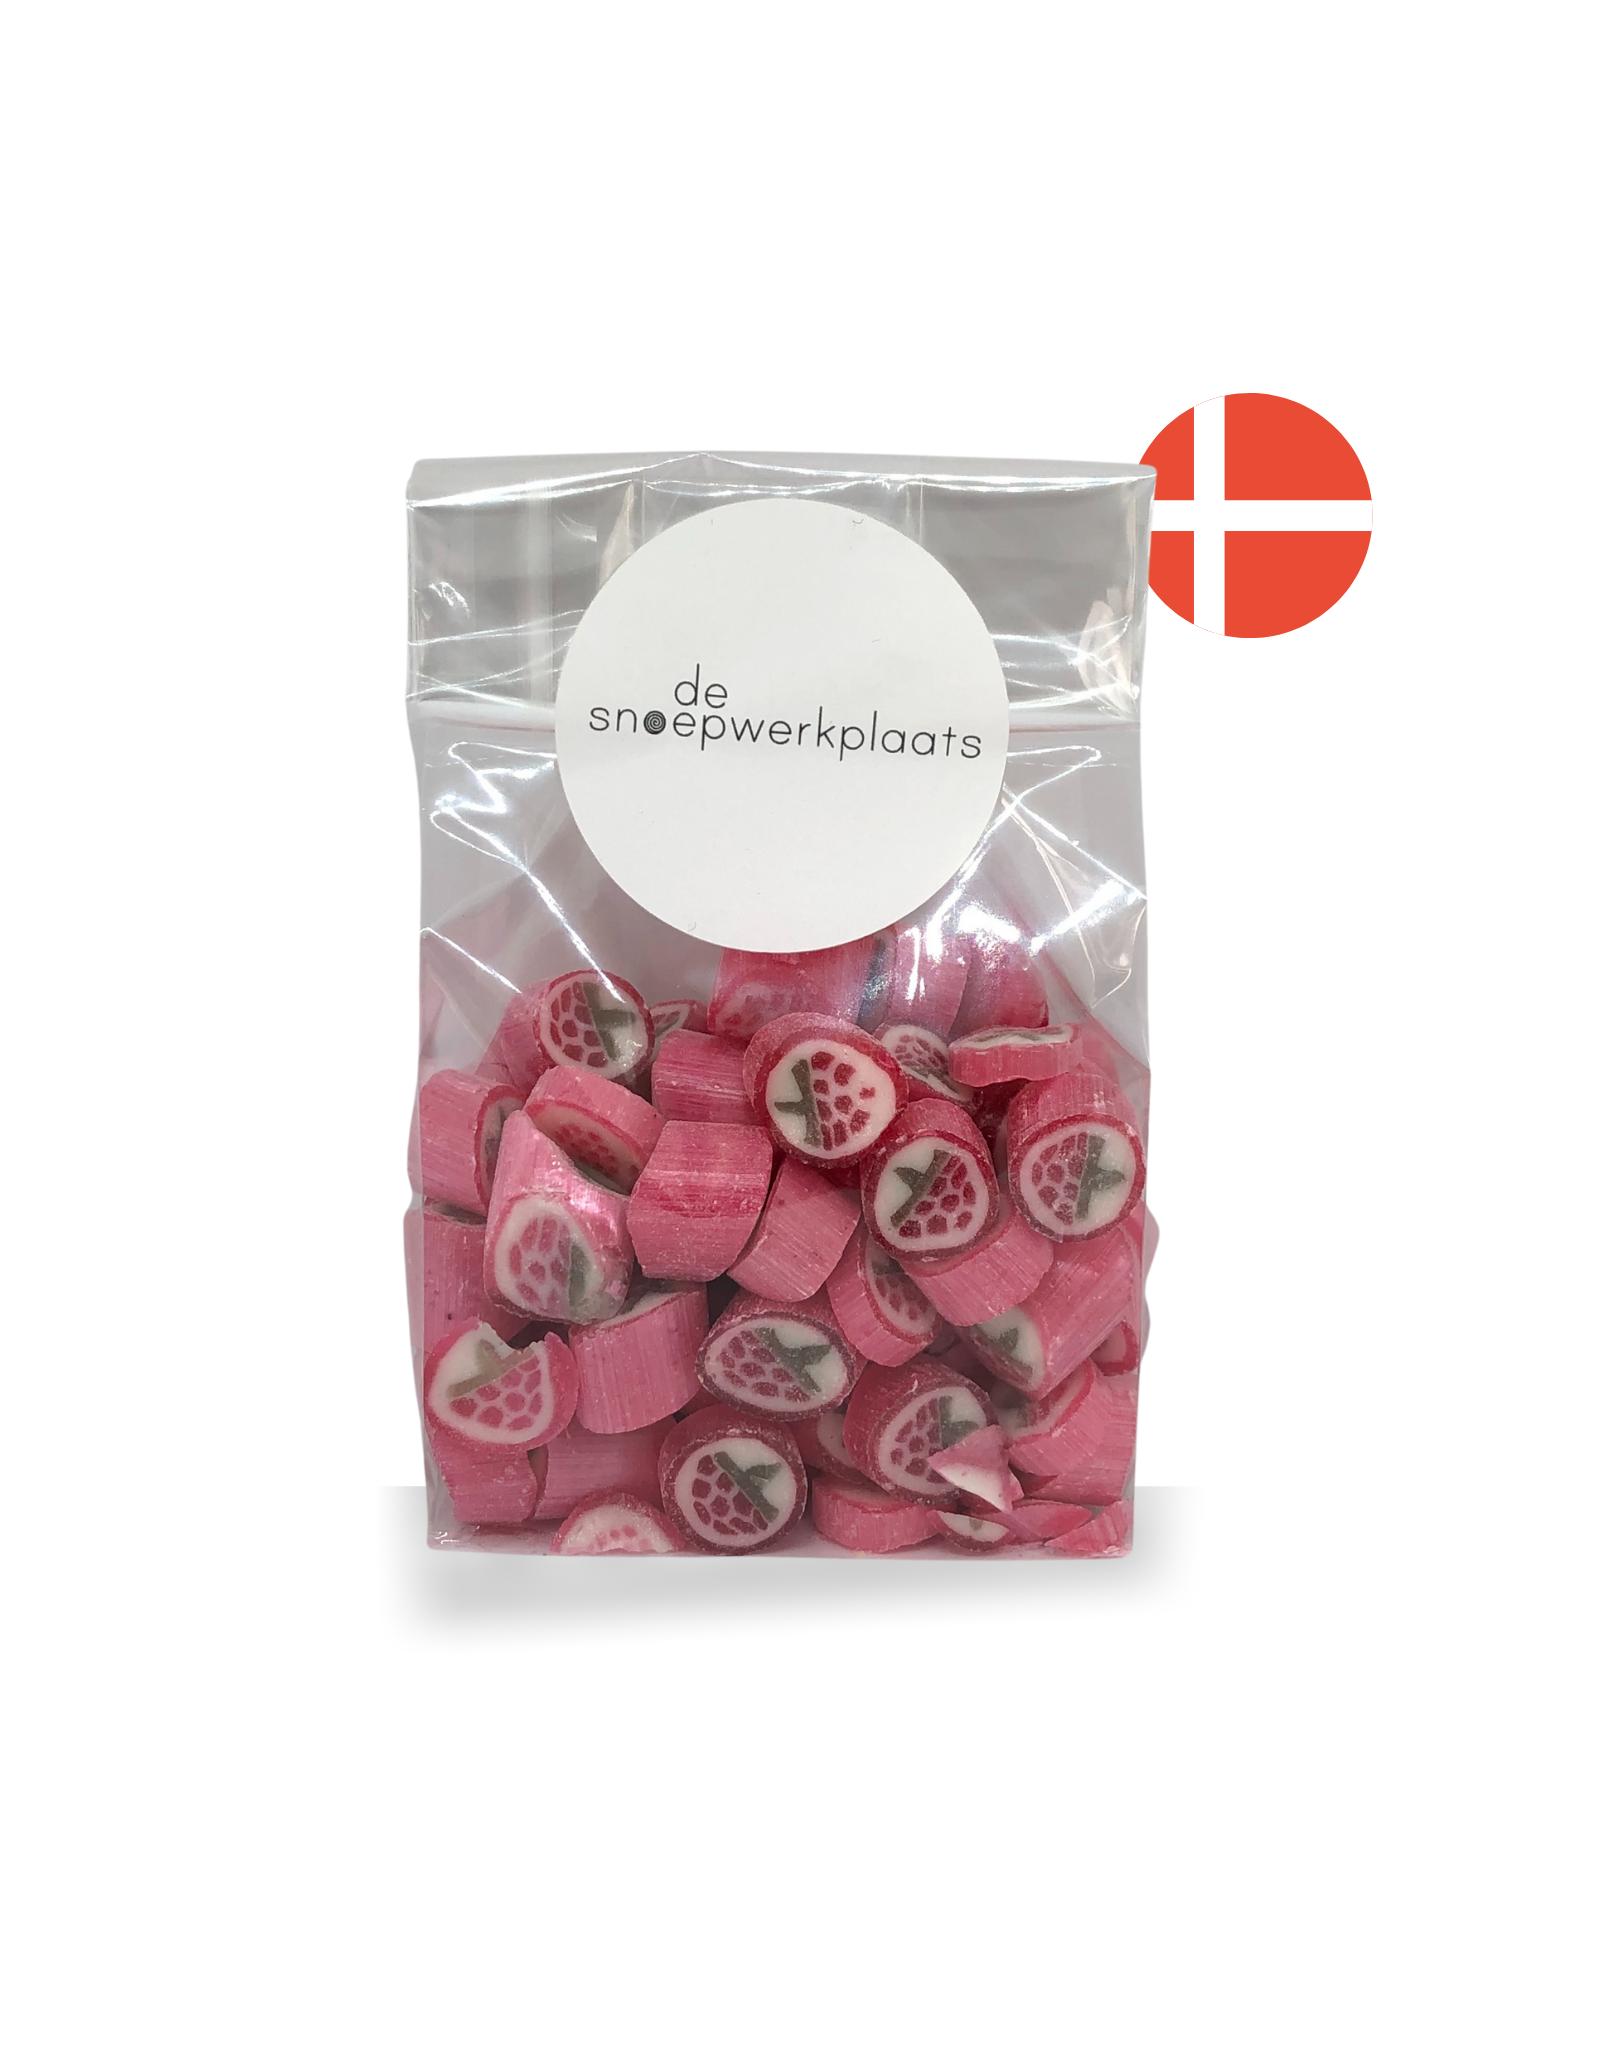 De Snoepwerkplaats Deense Snoepjes | Framboos